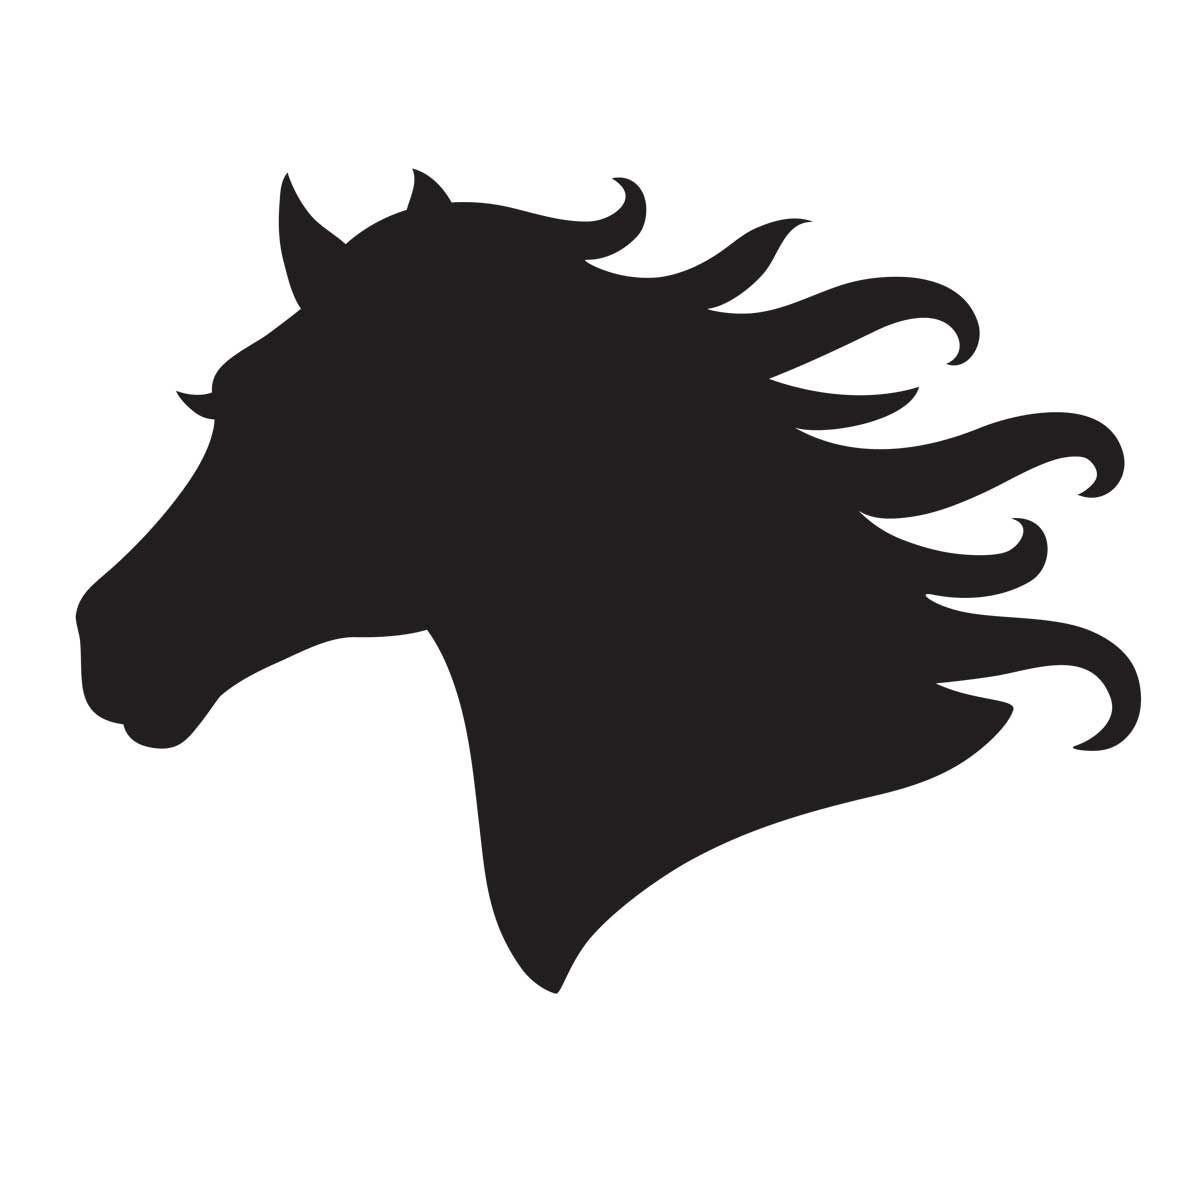 1200x1200 Horse Head Stencils Images Applique Horse Head